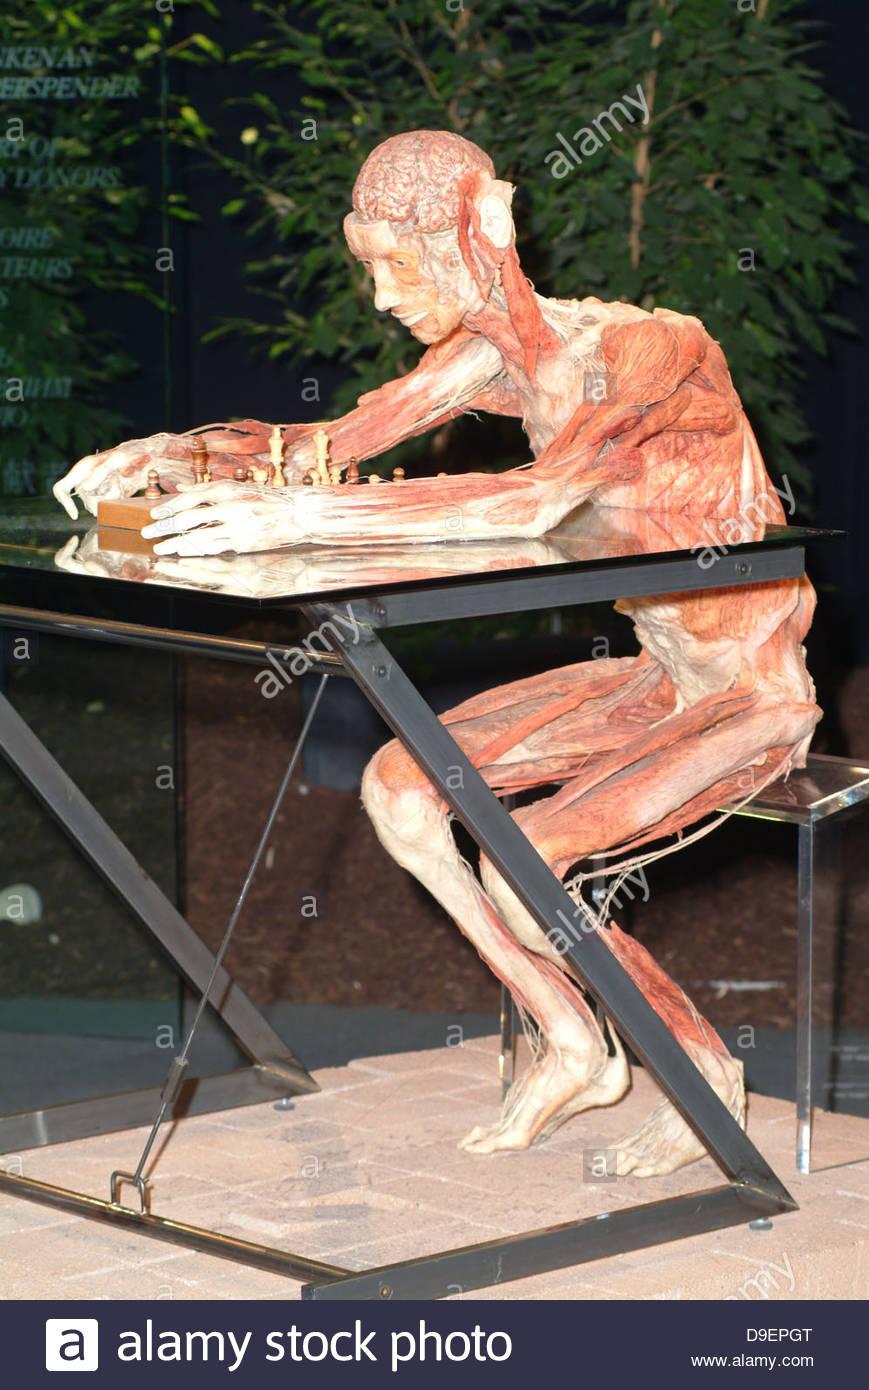 Anatomical Anatomy Autopsy Bodies Body Stock Photos & Anatomical ...